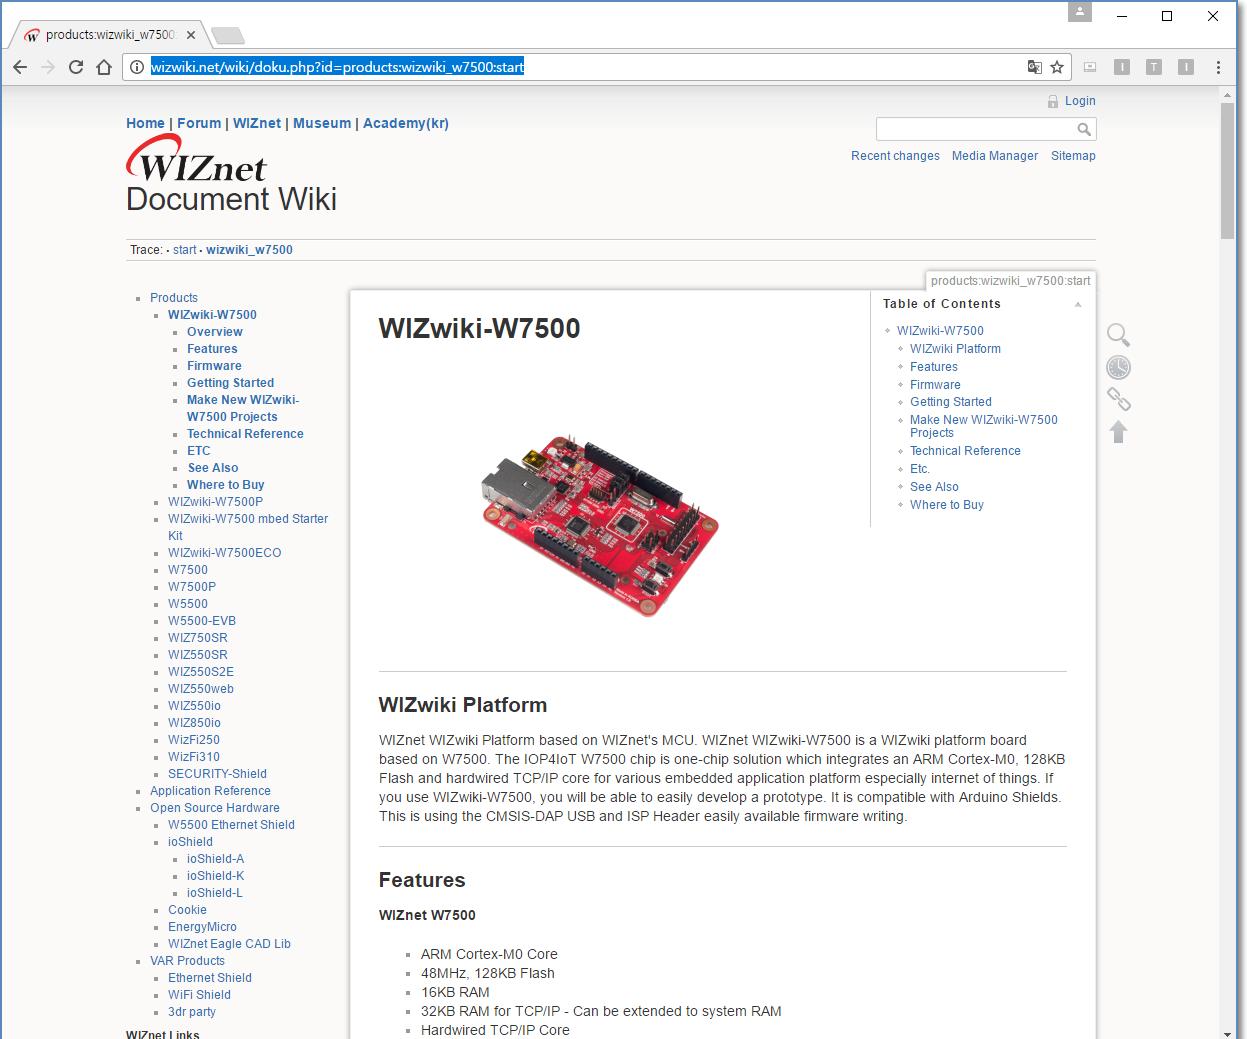 IoT Base Platform With GCC, Eclipse, WIZwiki-W7500 : Serial to Ethernet